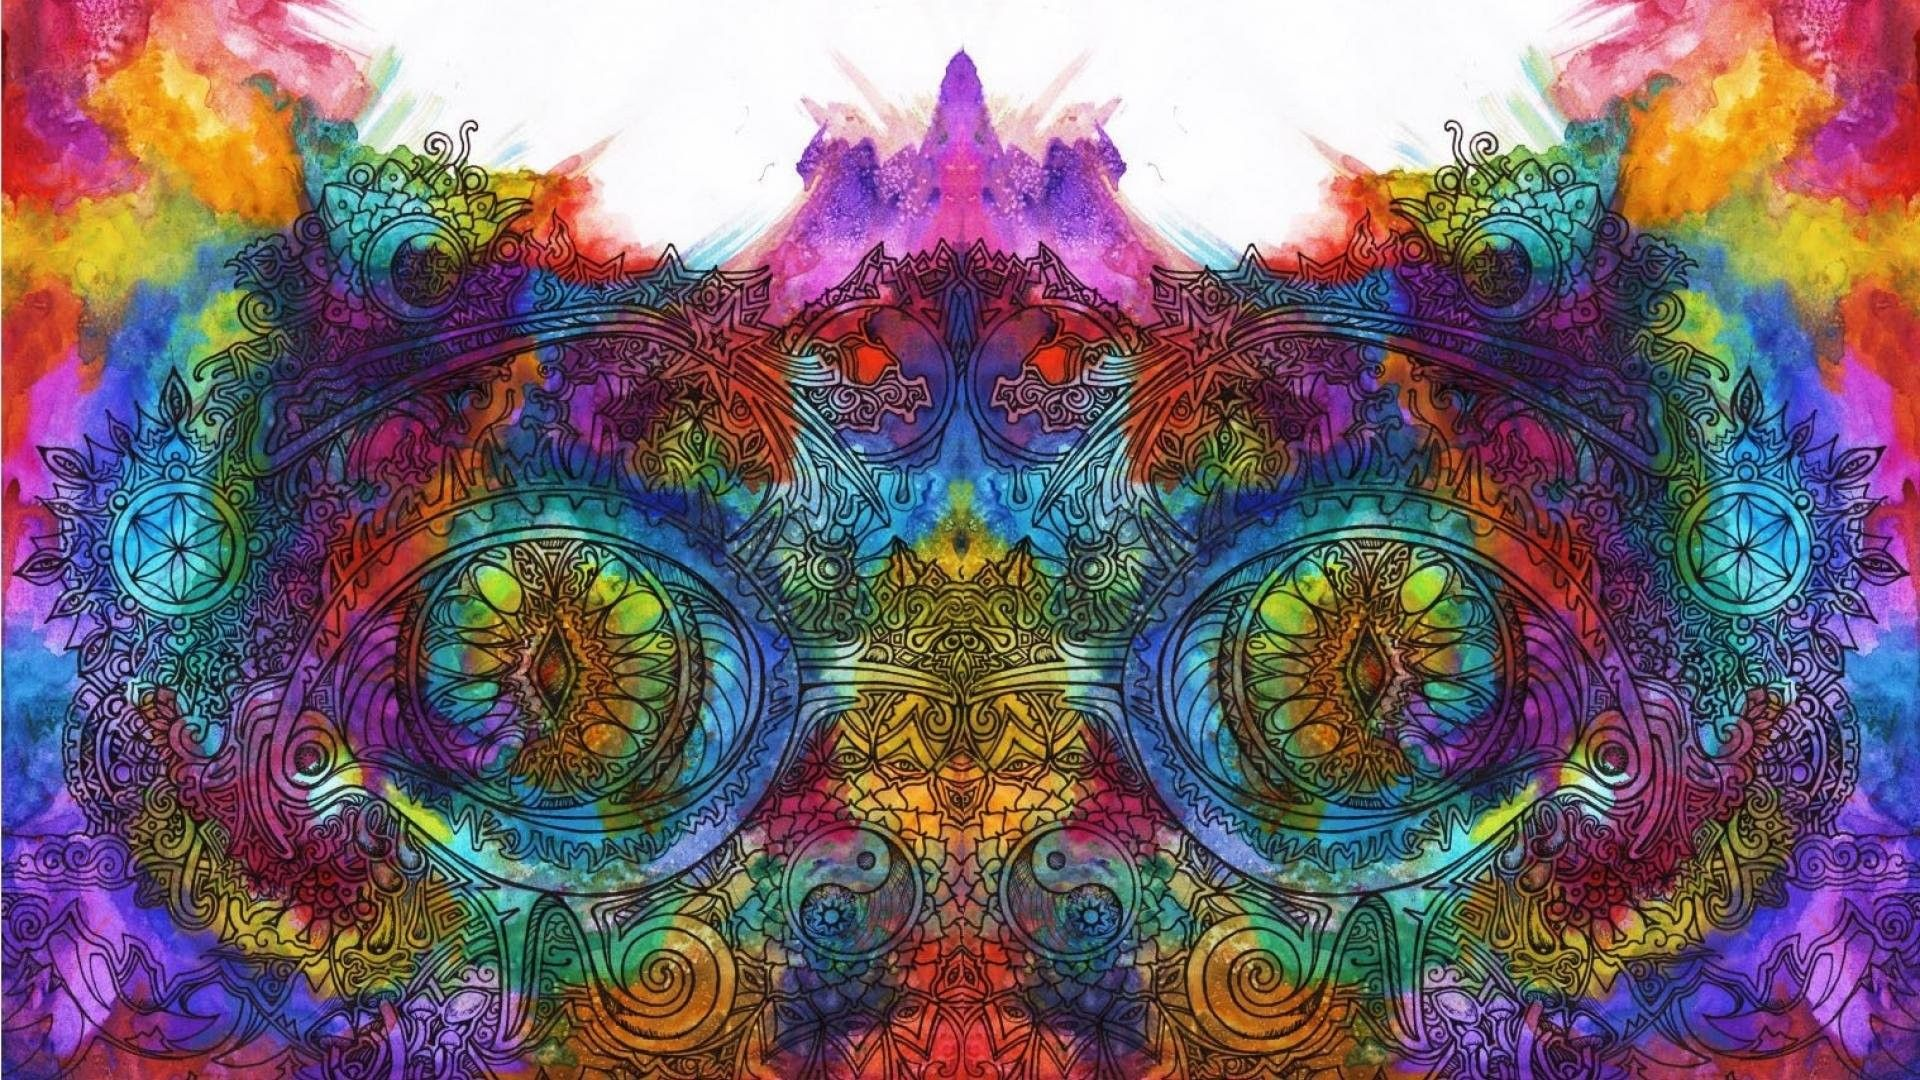 Desktop Wallpaper Psychedelic Trippy Wallpaper Psychedelic Cute Wallpapers